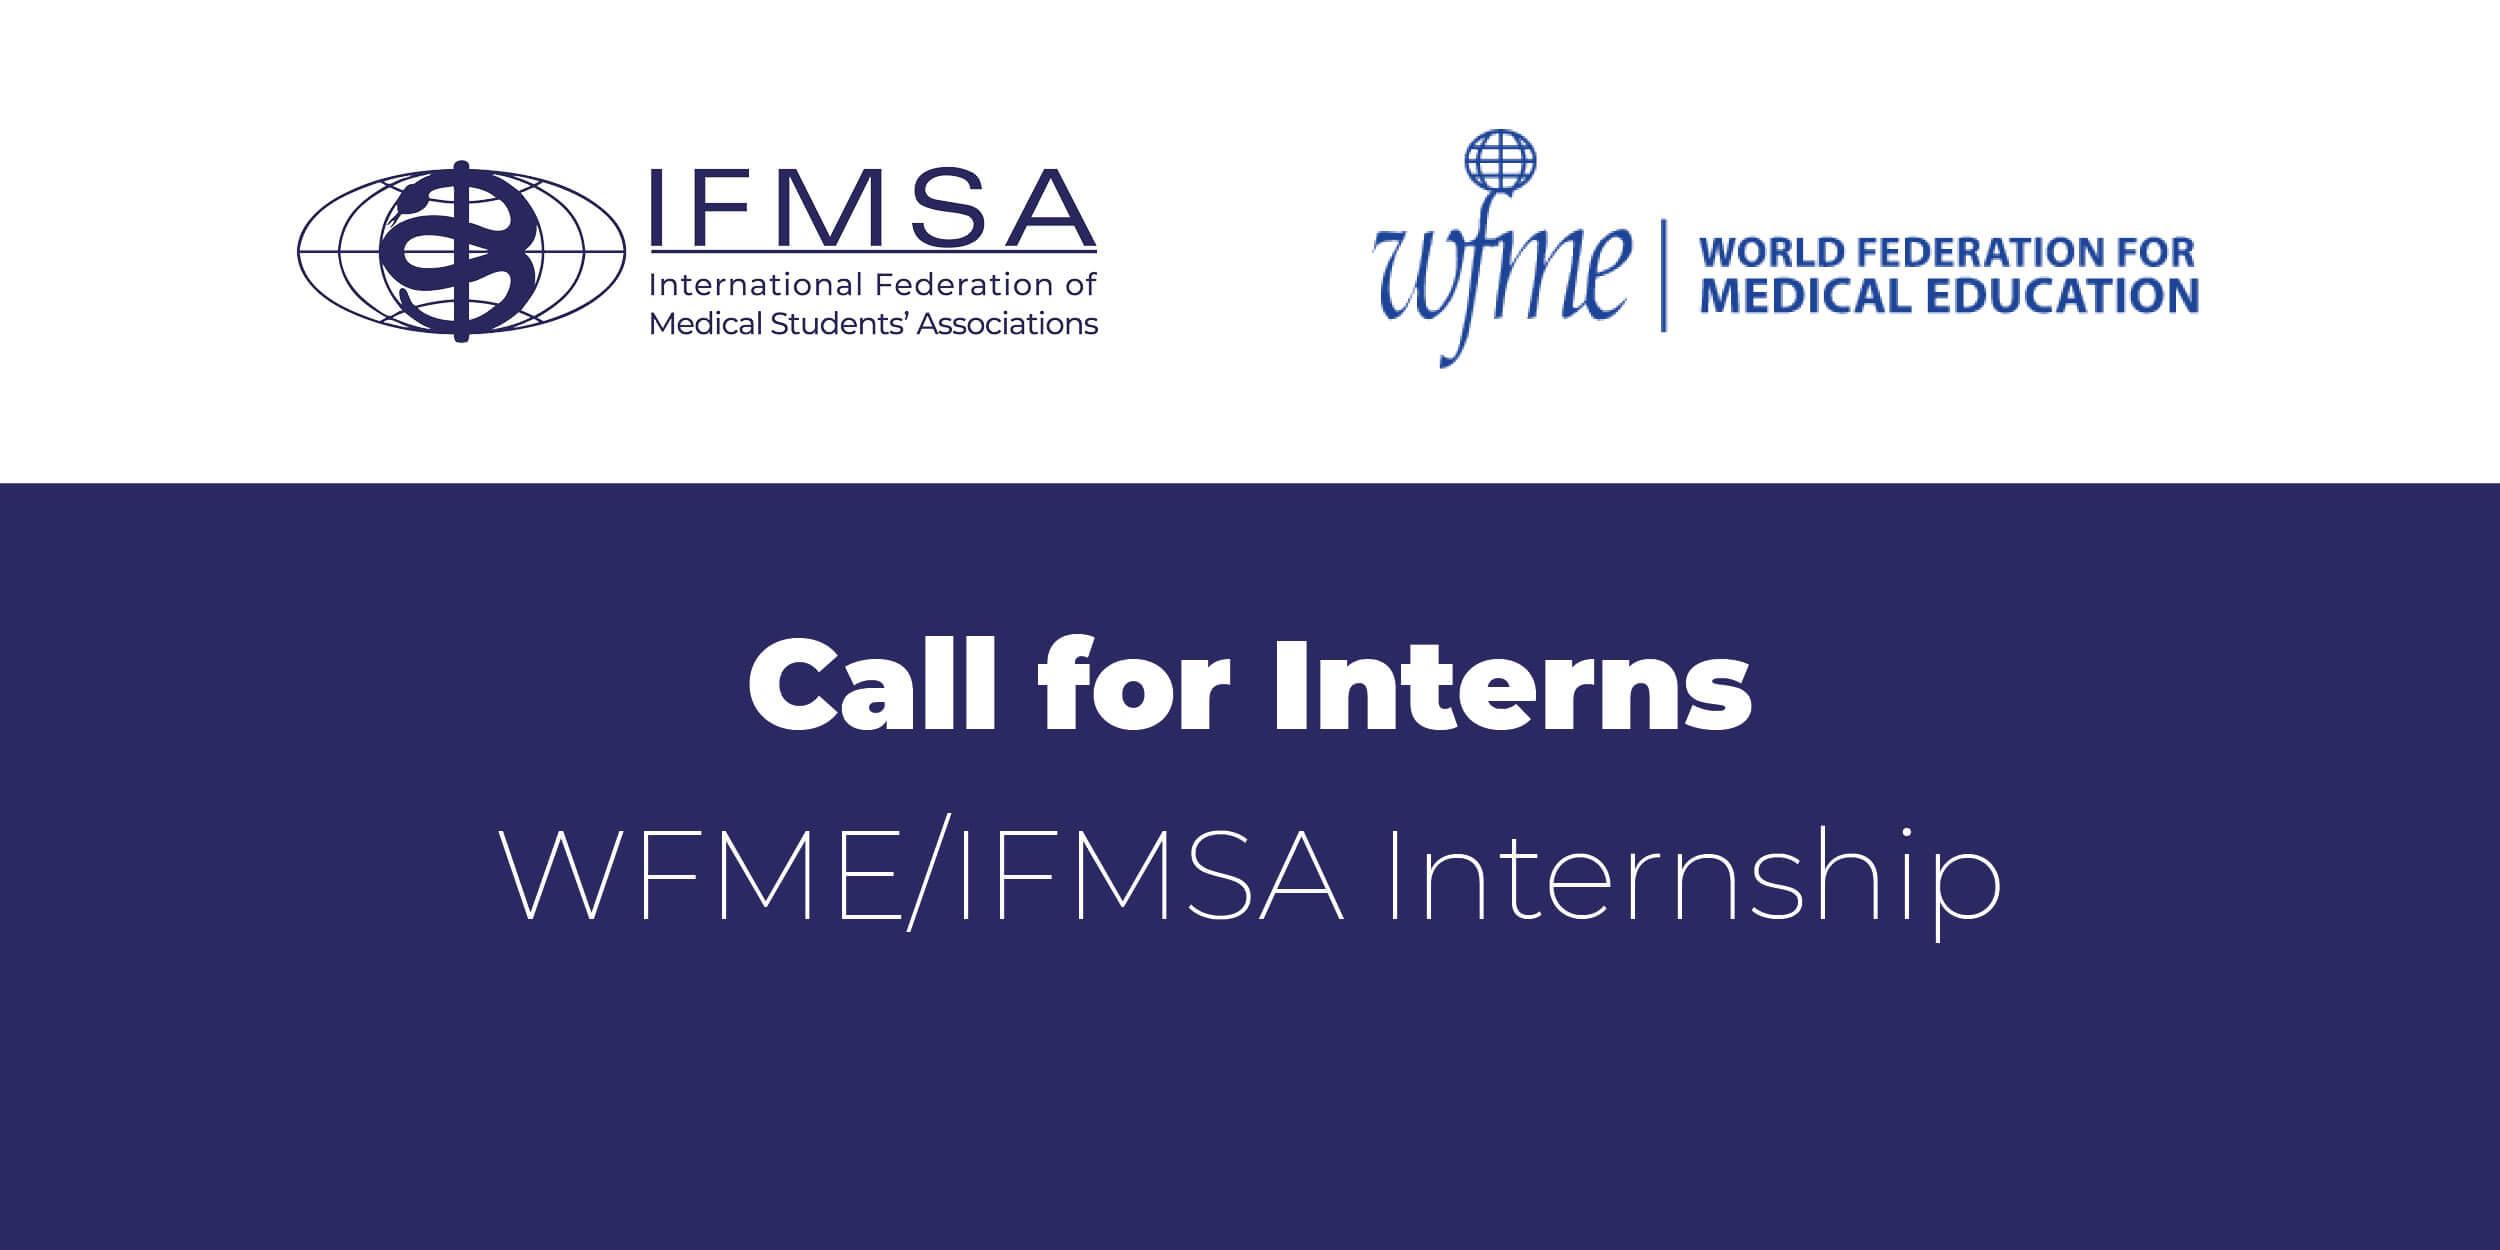 Call for Interns – WFME/IFMSA Internship